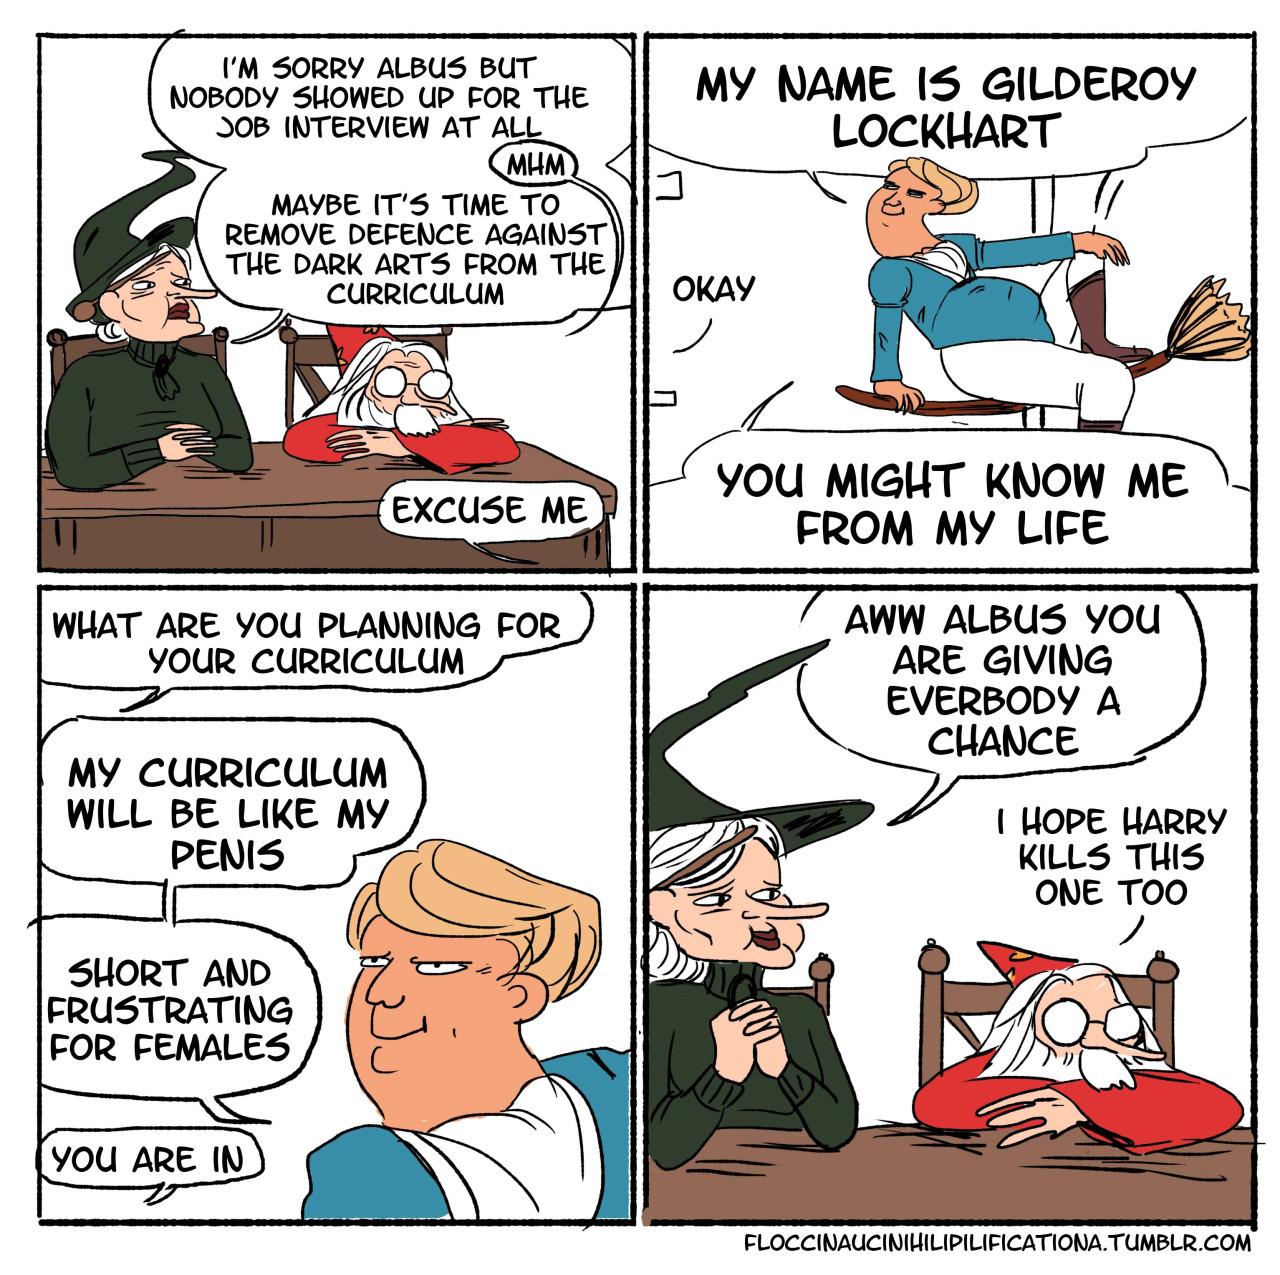 Hogwarts is looking for a new teacher, enter Gilderoy